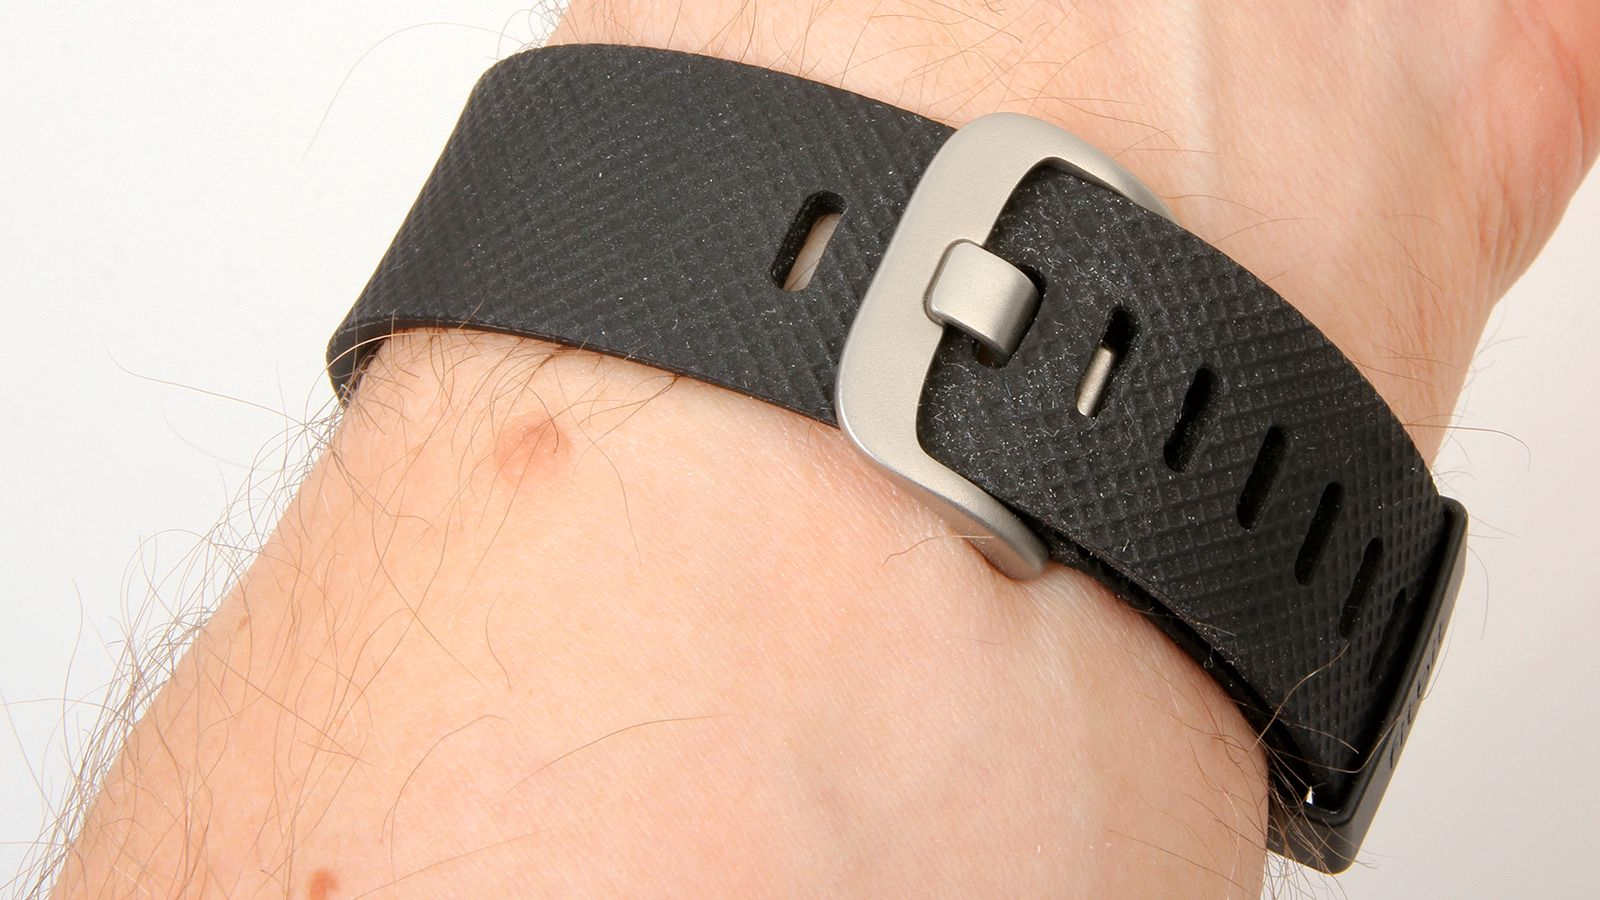 Remmen har en bedre låsemekanisme enn den vanlige Fitbit Charge-modellen. Foto: Kurt Lekanger, Tek.no